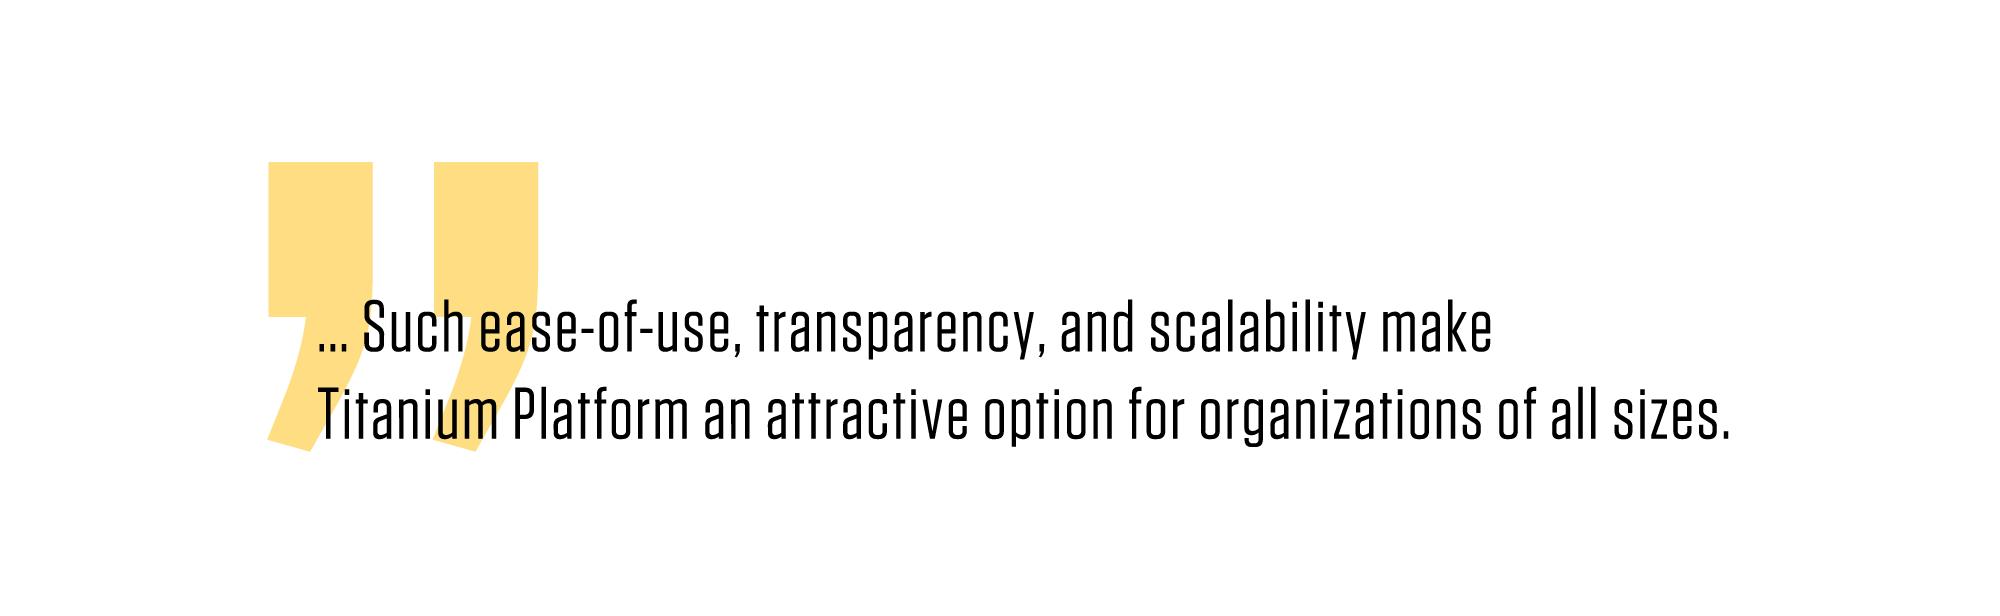 SC Labs Quote